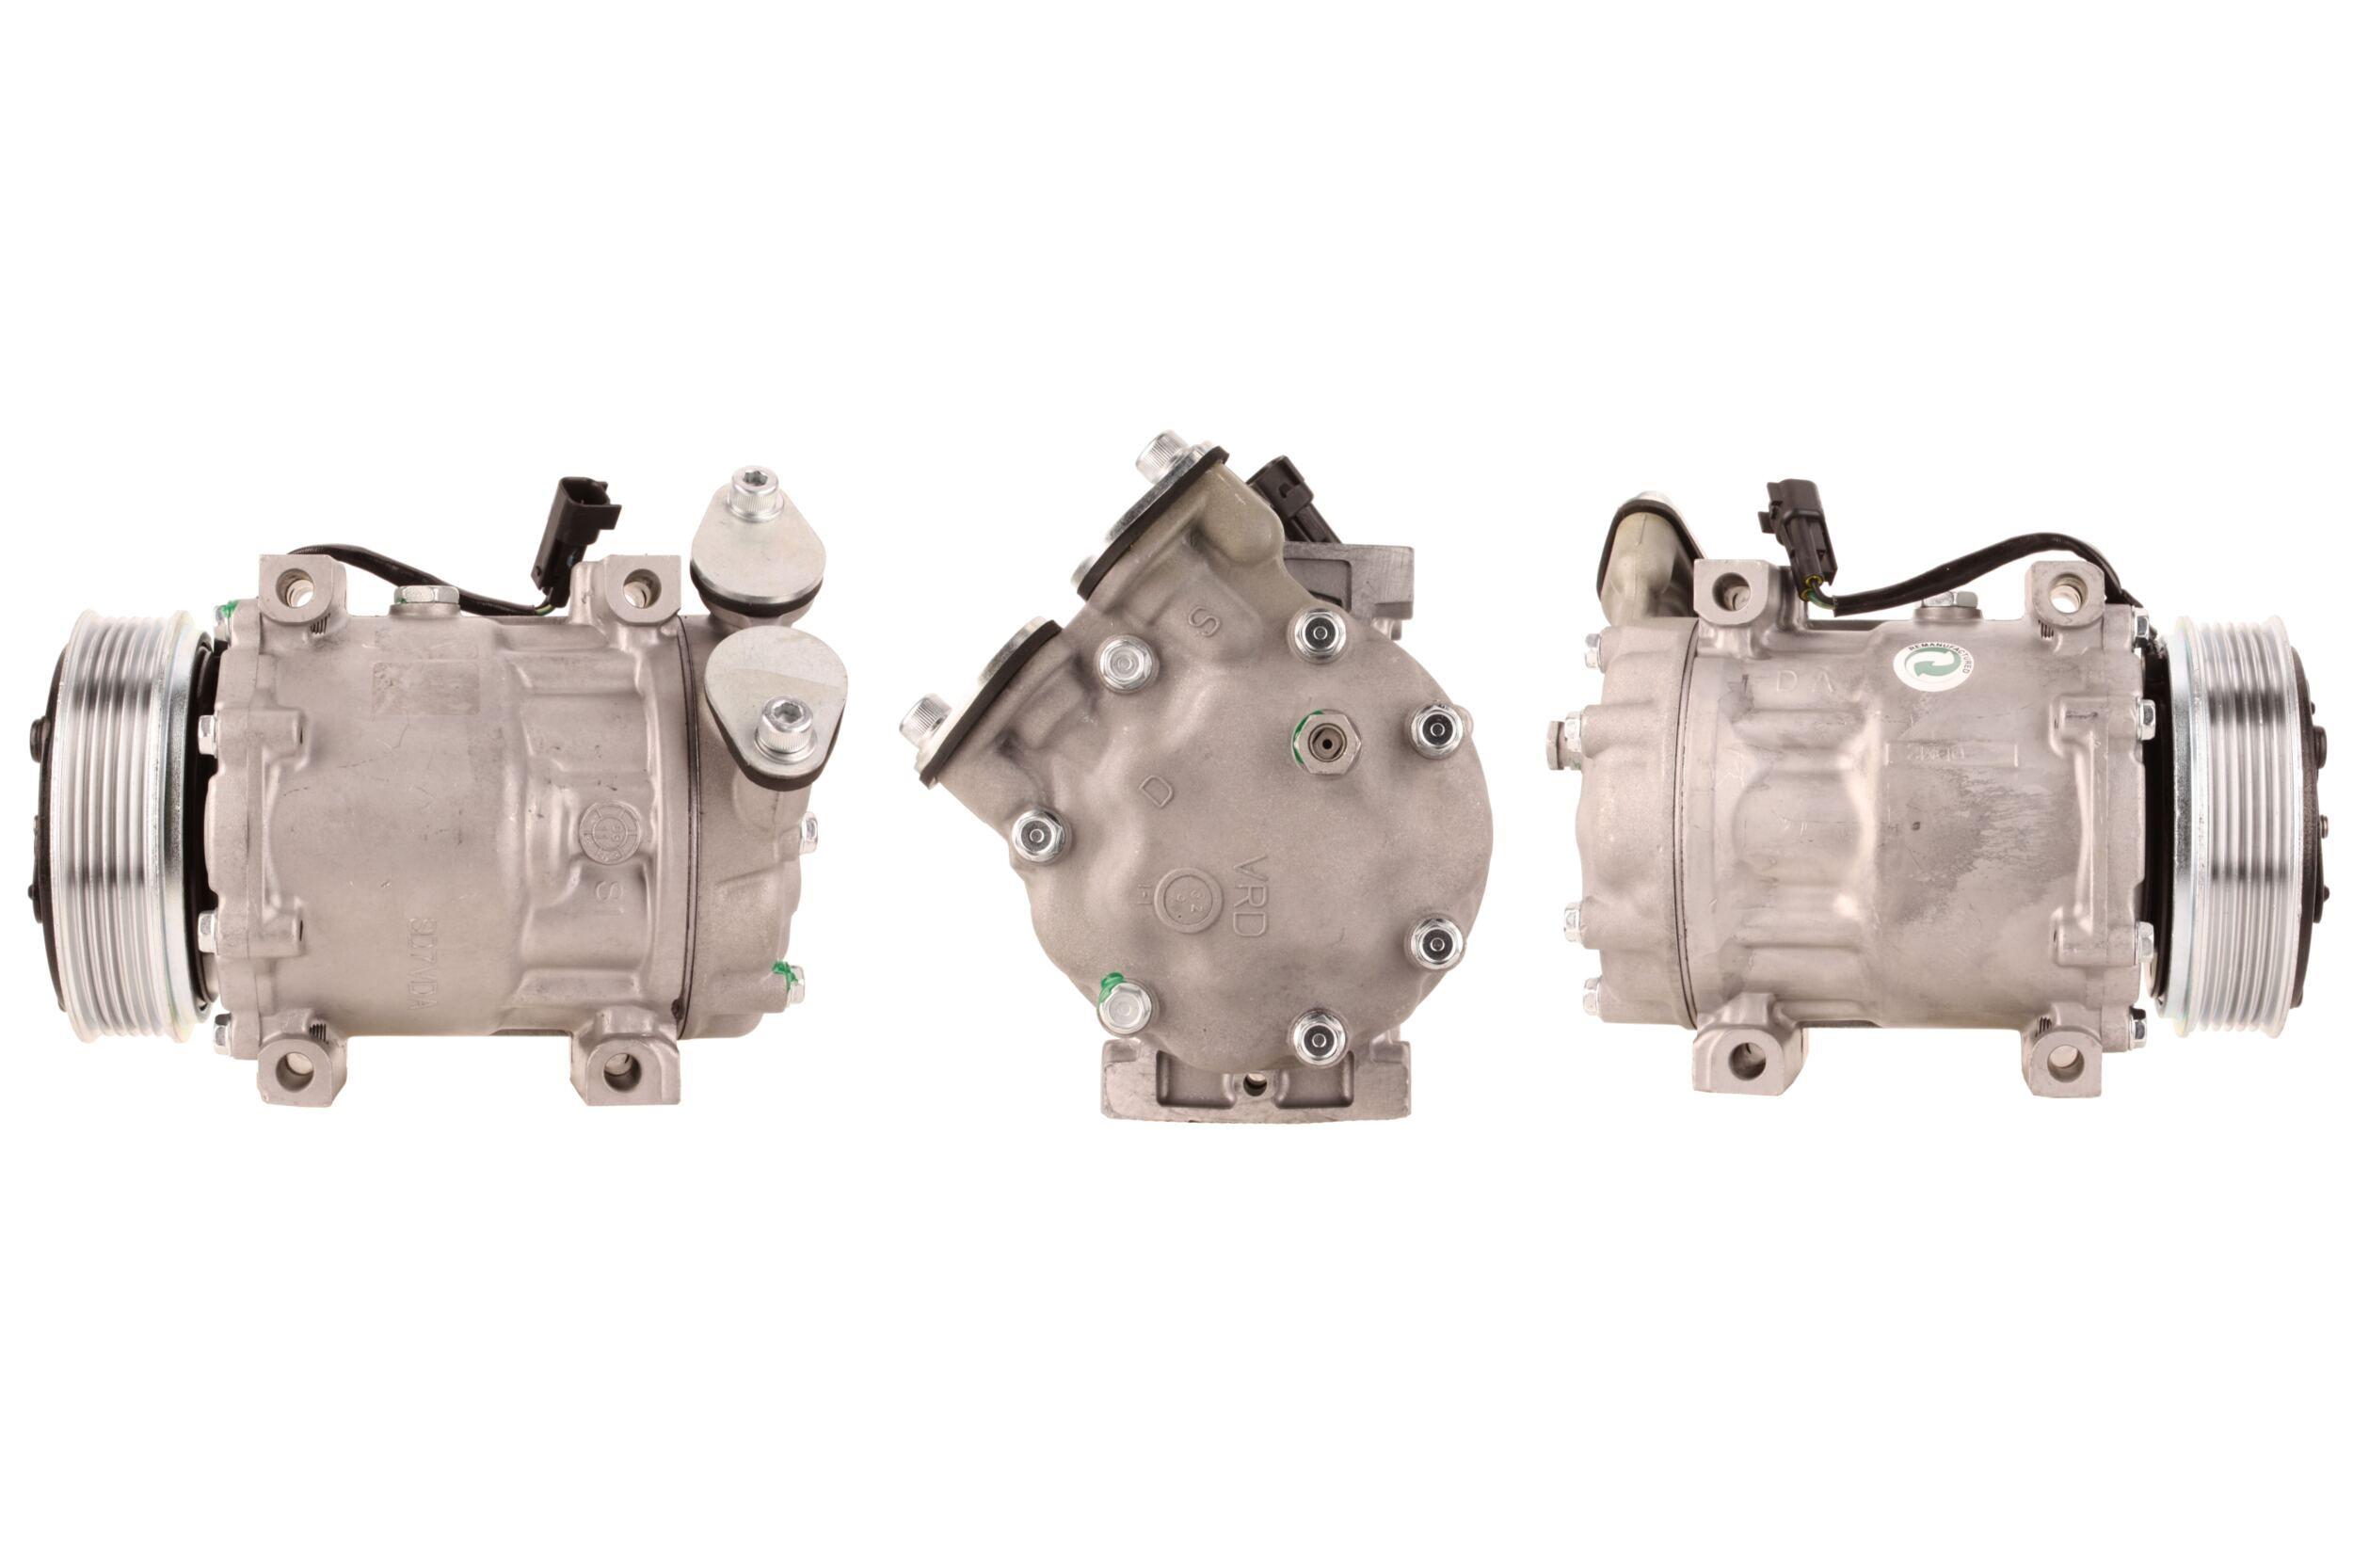 Kompressor ELSTOCK 51-0227